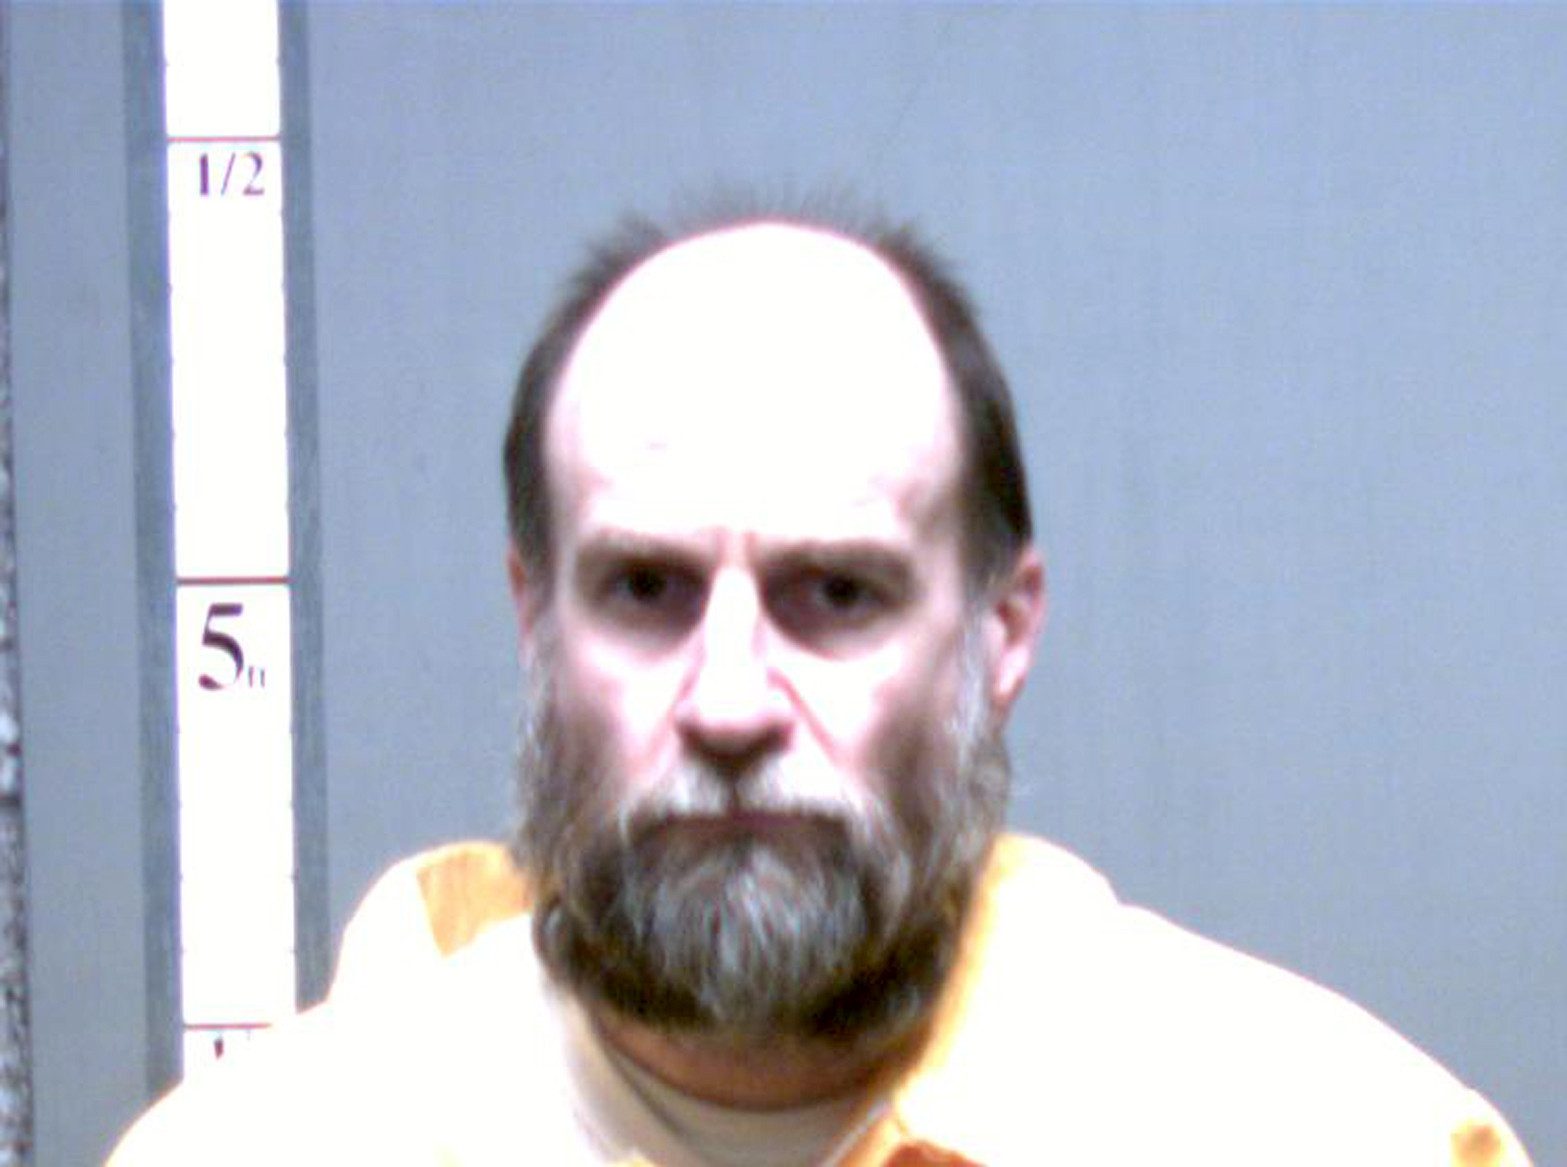 Cheshire CT Police Lockup & Inmate Search - Cheshire, CT